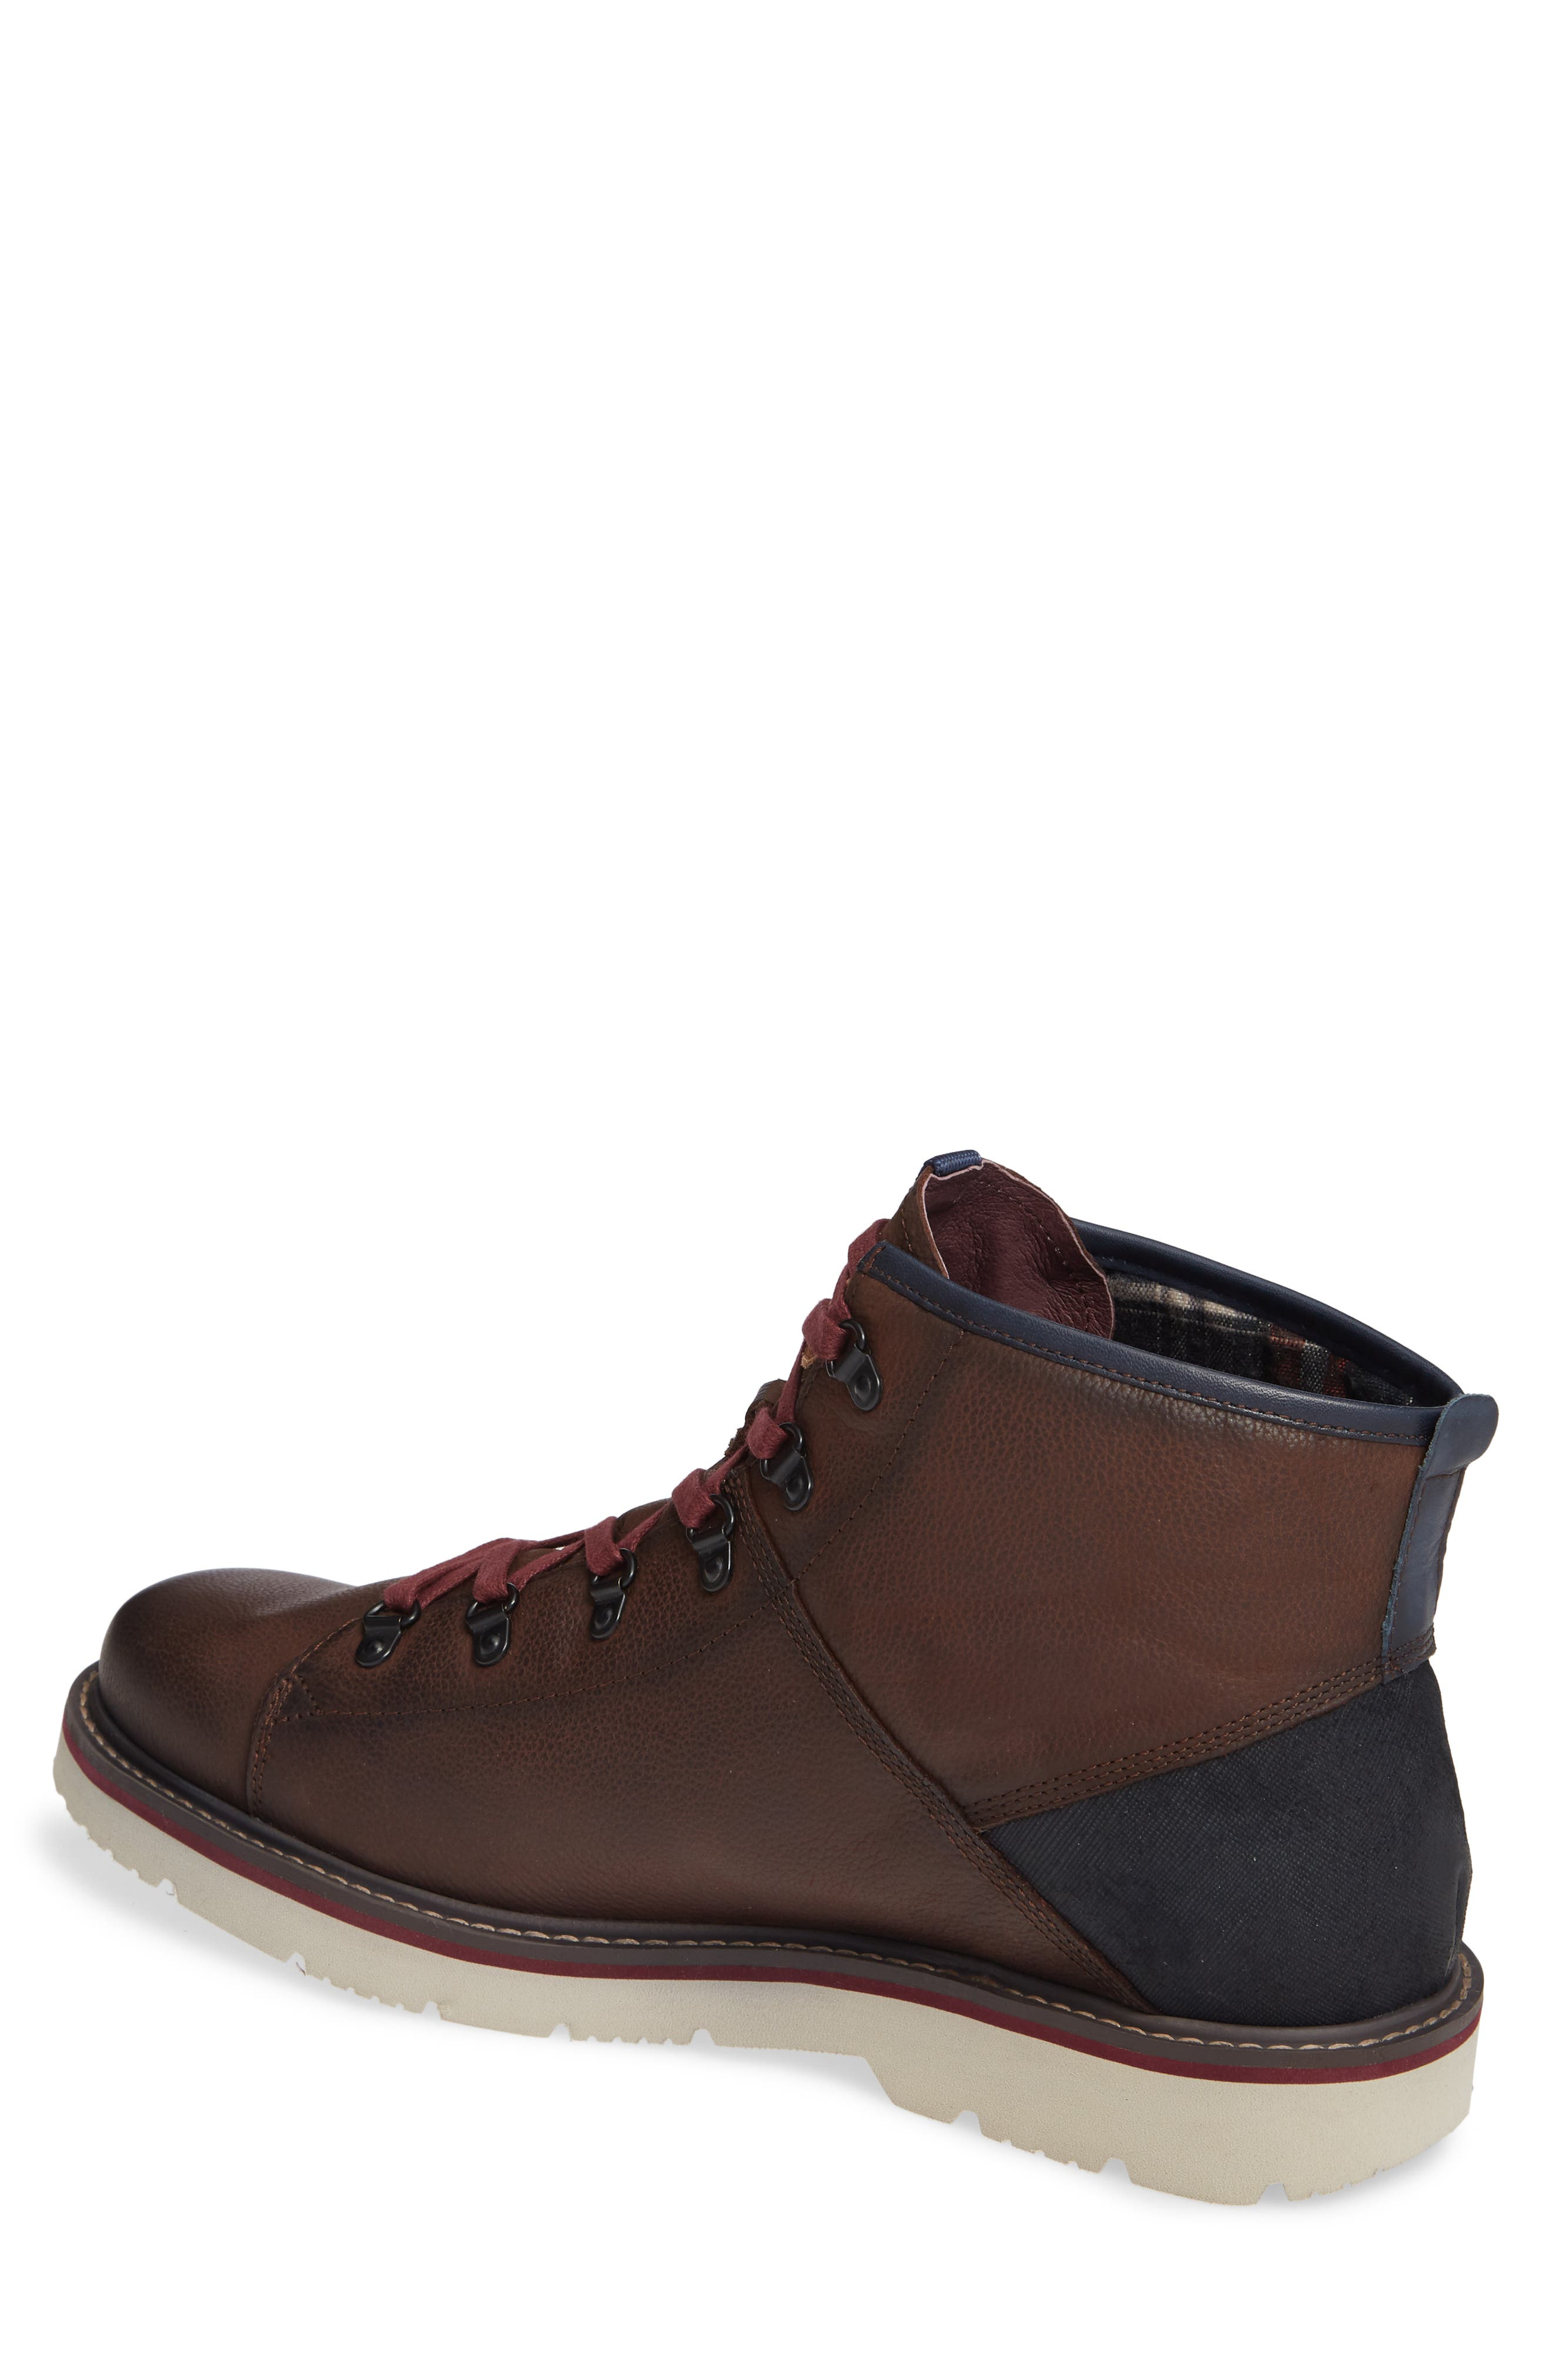 LLeida Plain Toe Boot,                             Alternate thumbnail 2, color,                             617